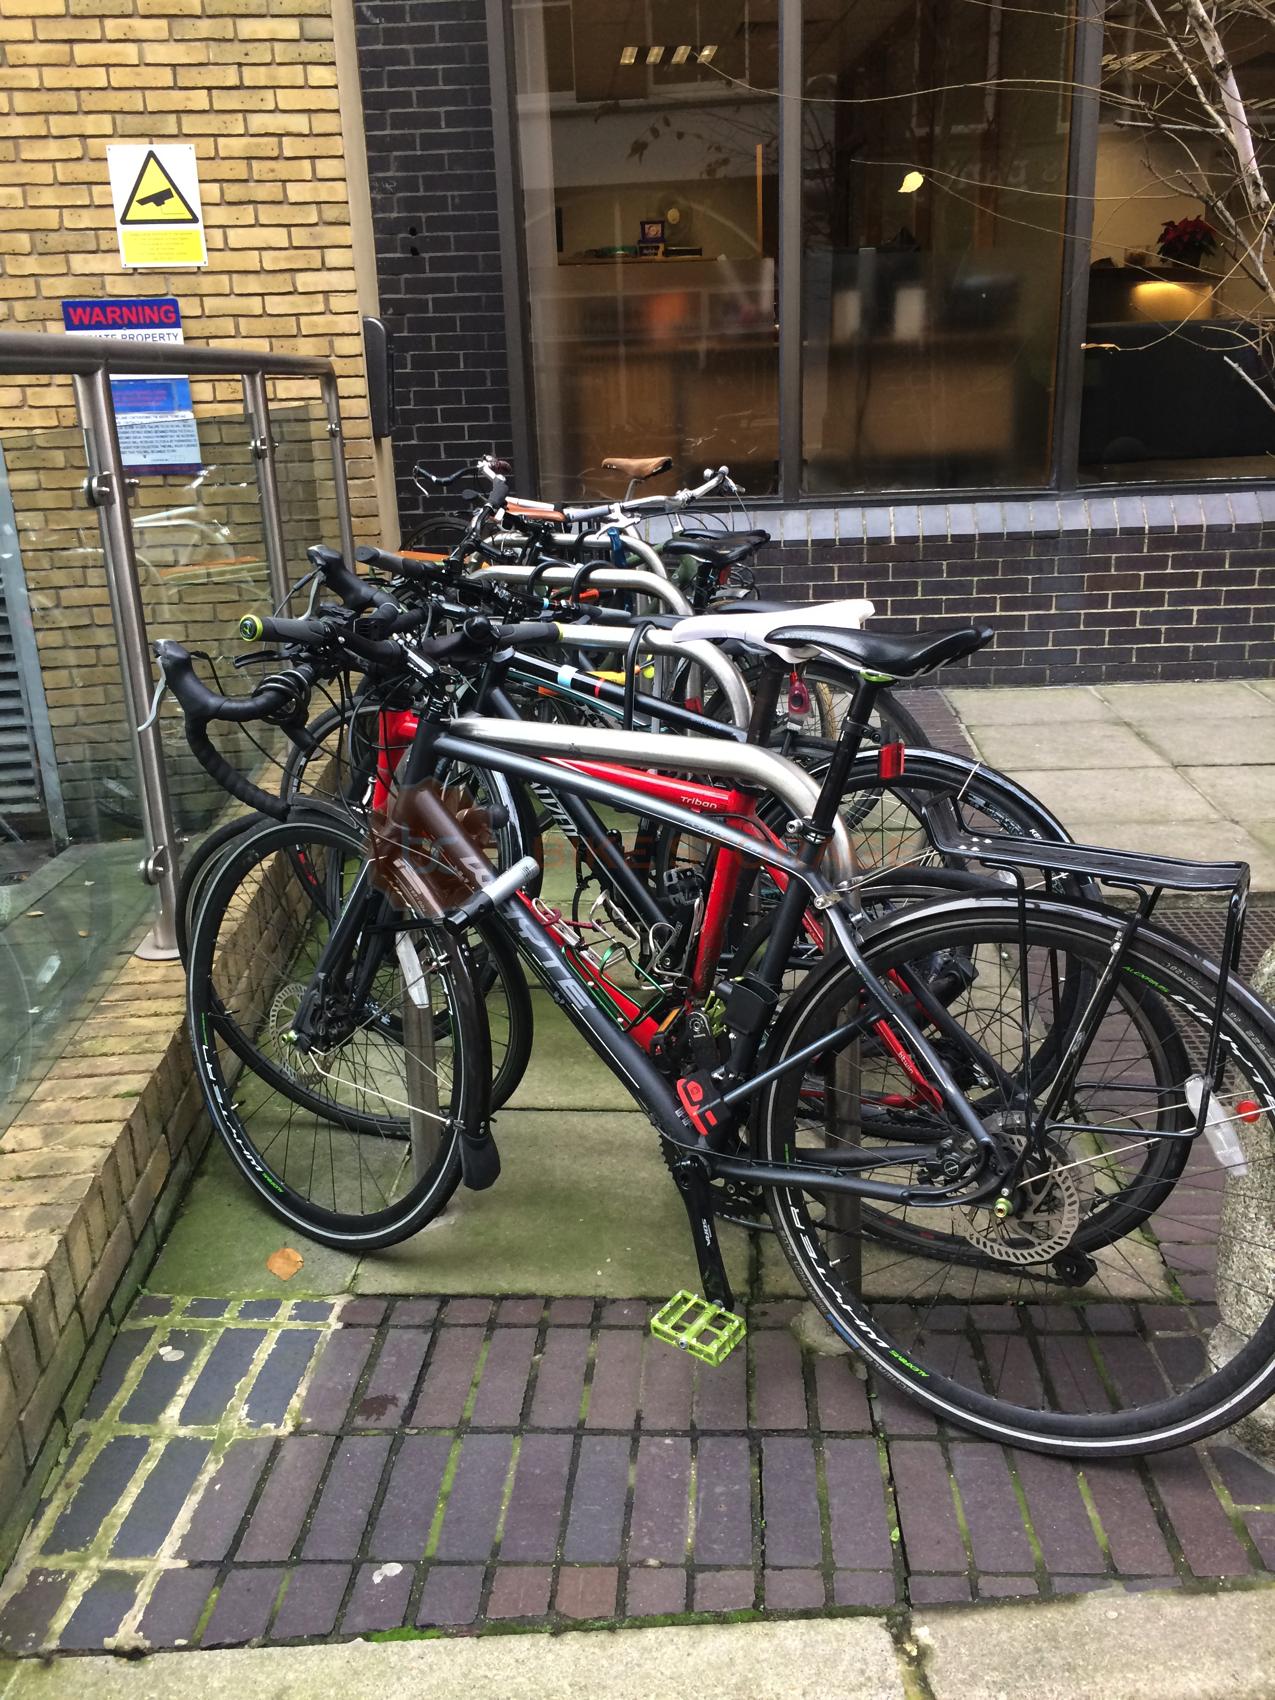 Sheffield Cycle Stand | The Bike Storage Company